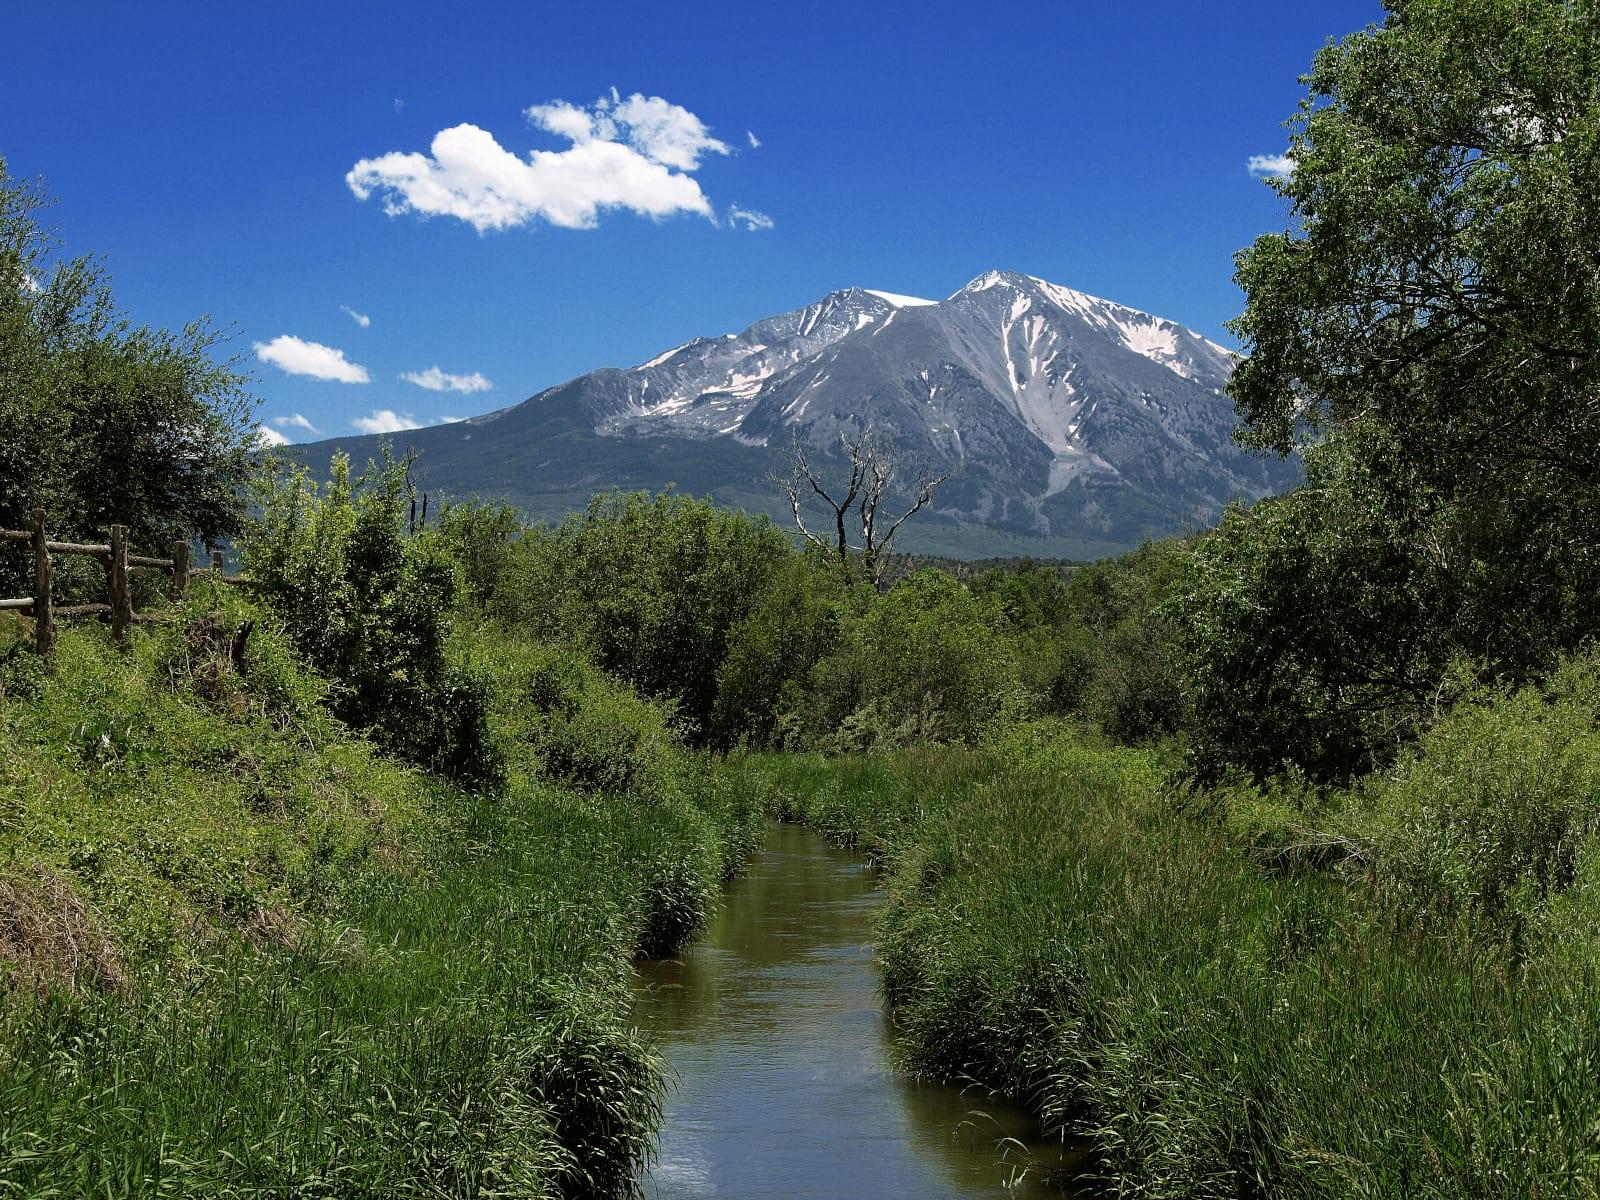 Rio Grande Trail Glenwood Springs to Aspen, CO Hike